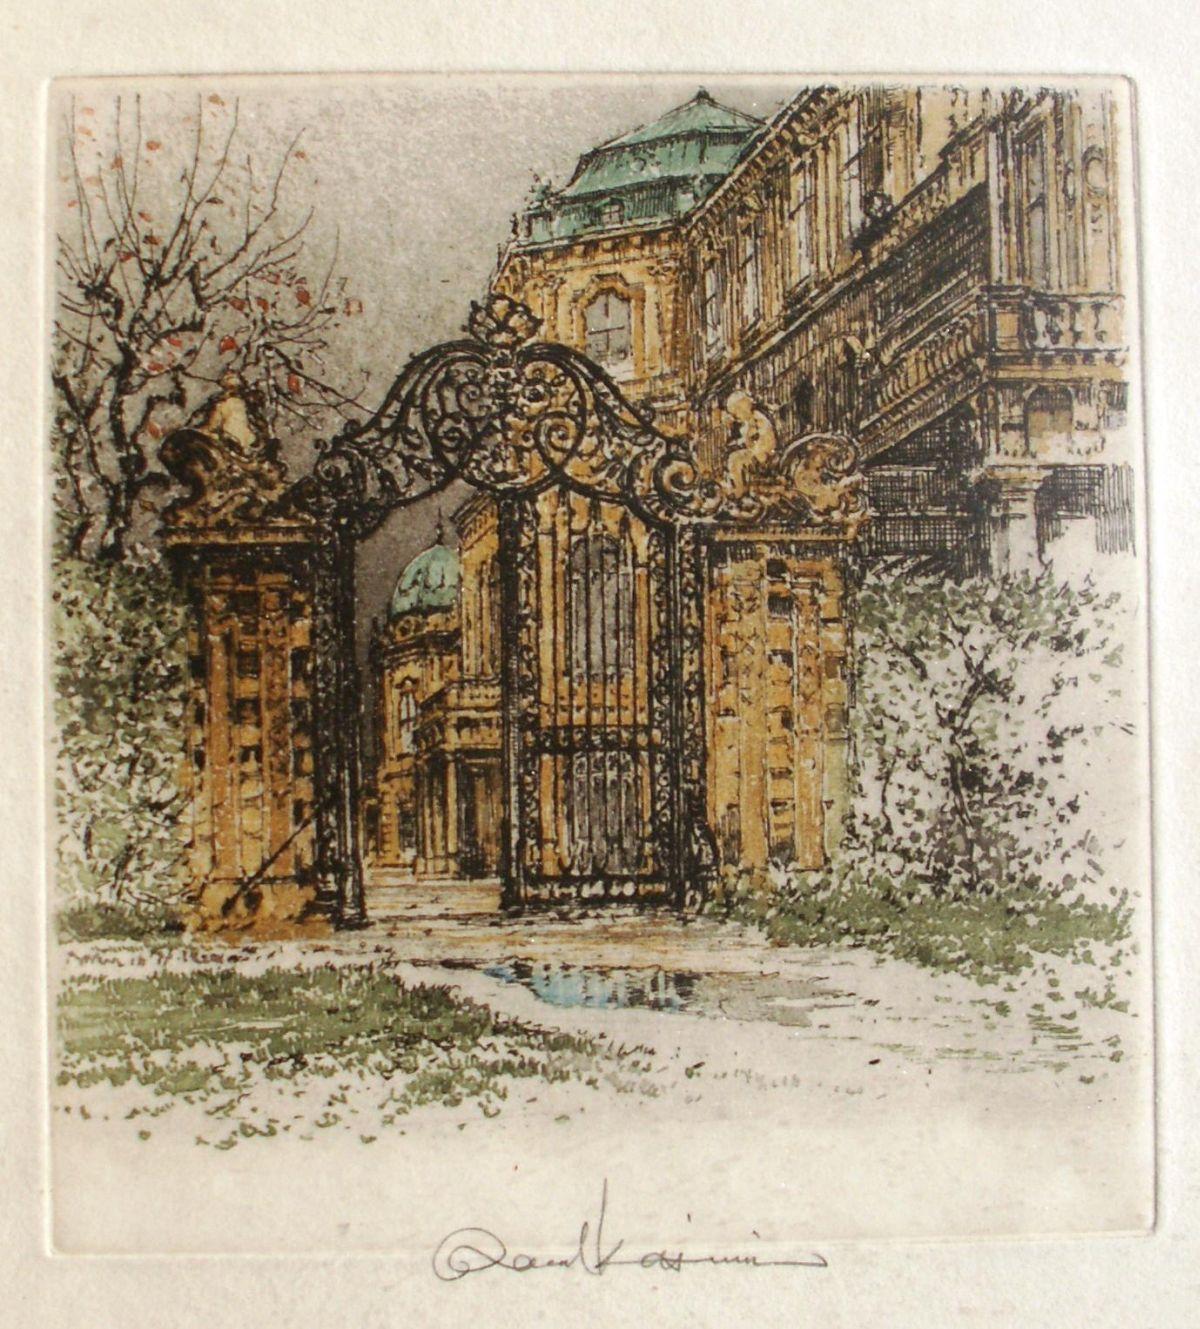 Robert Kasimir - Belvedere, Wien, Farbradierung kopen? Bied vanaf 110!